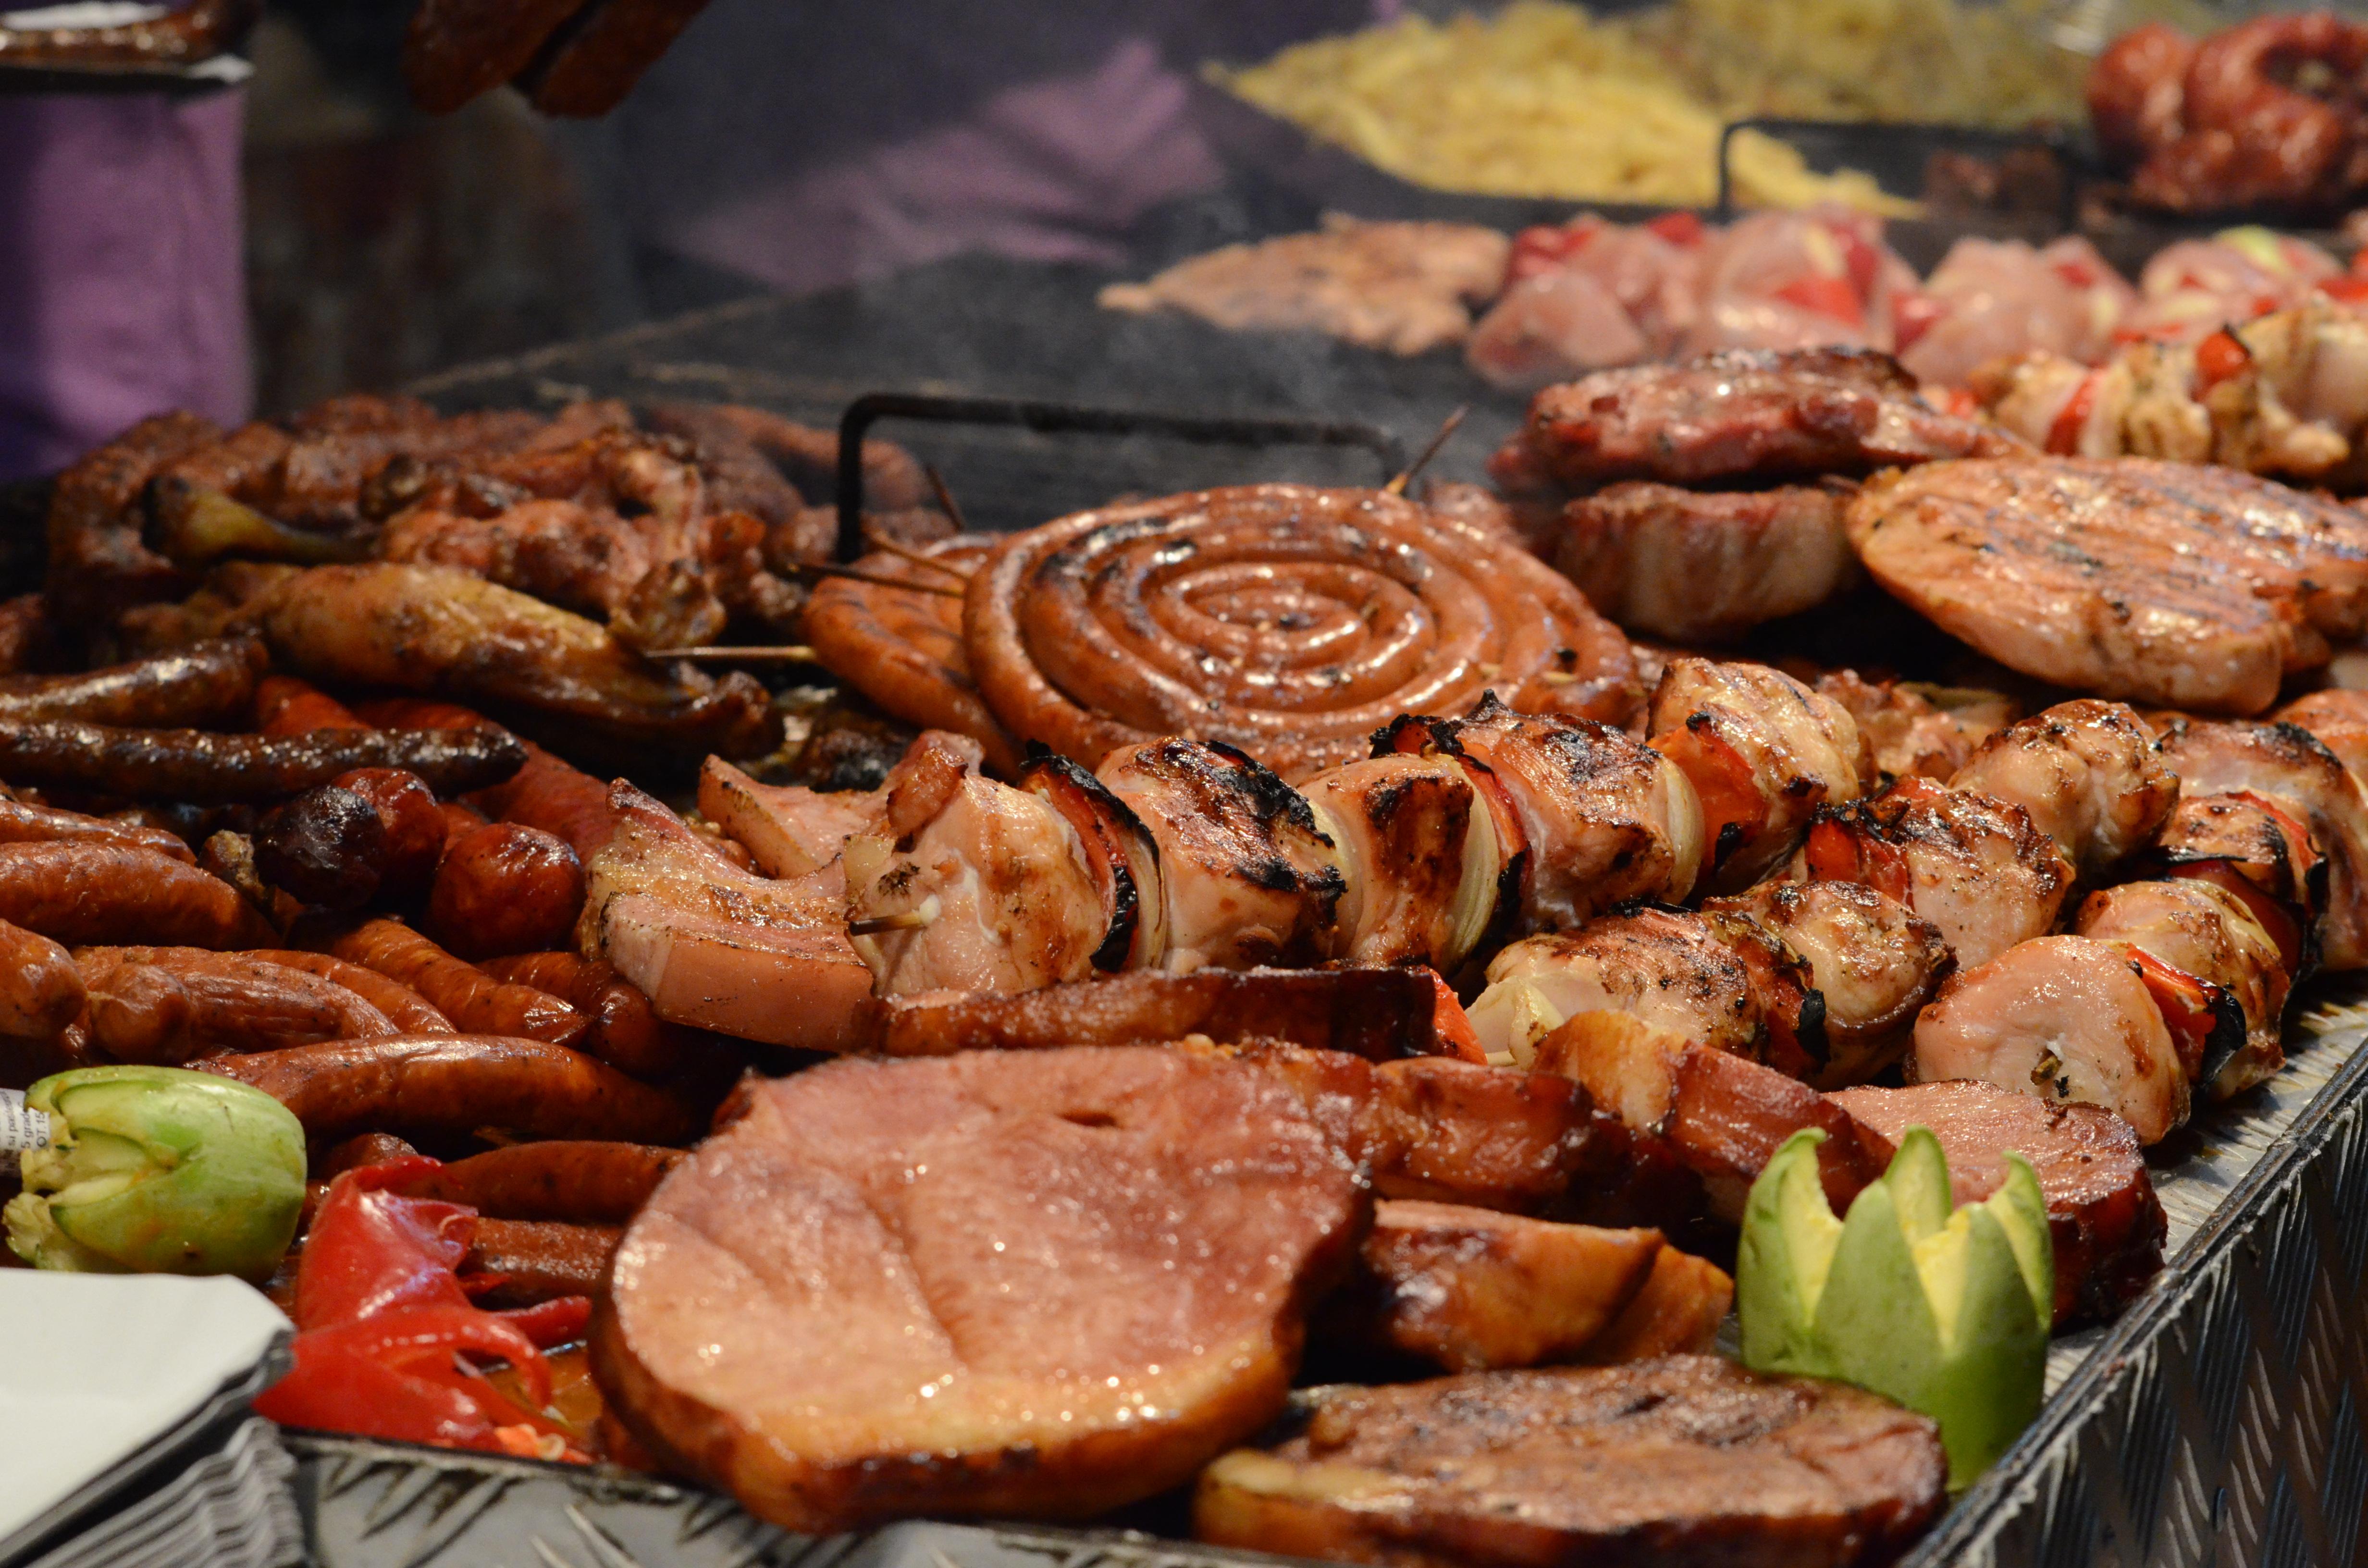 Brazilian Churrasco Food Truck